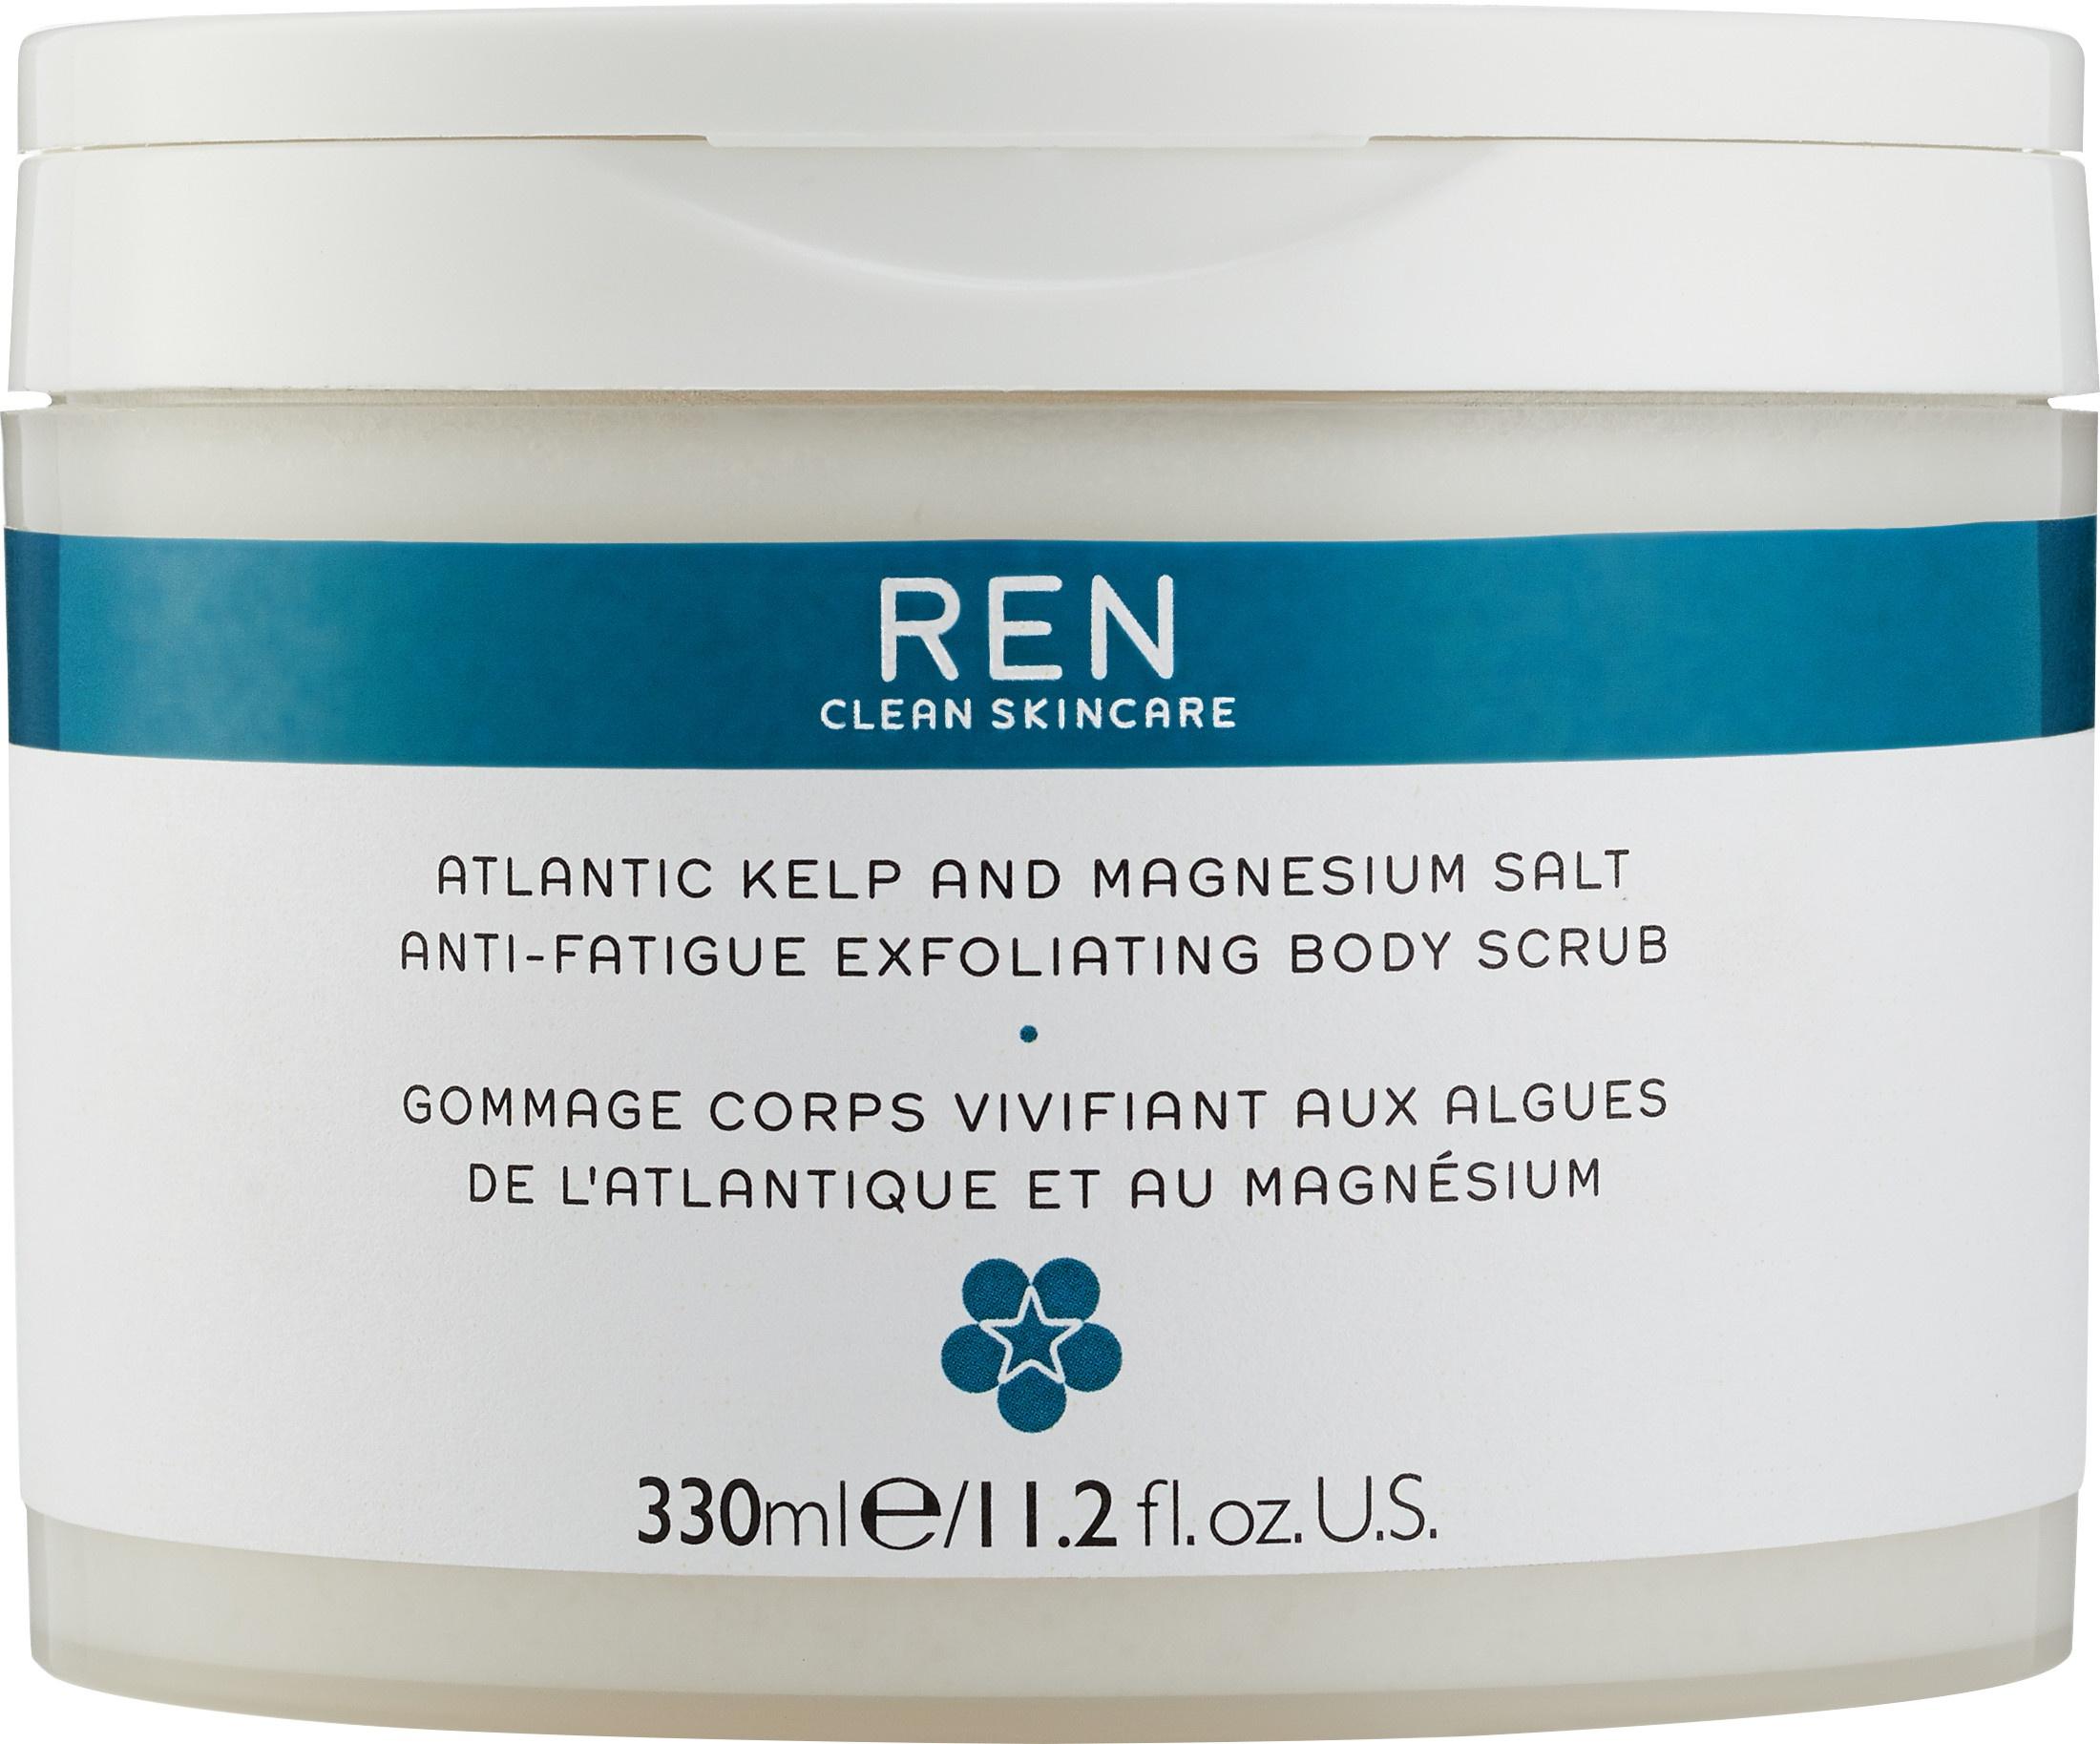 REN Atlantic Kelp And Magnesium Salt Anti-Fatigue Exfoliating Body Scrub